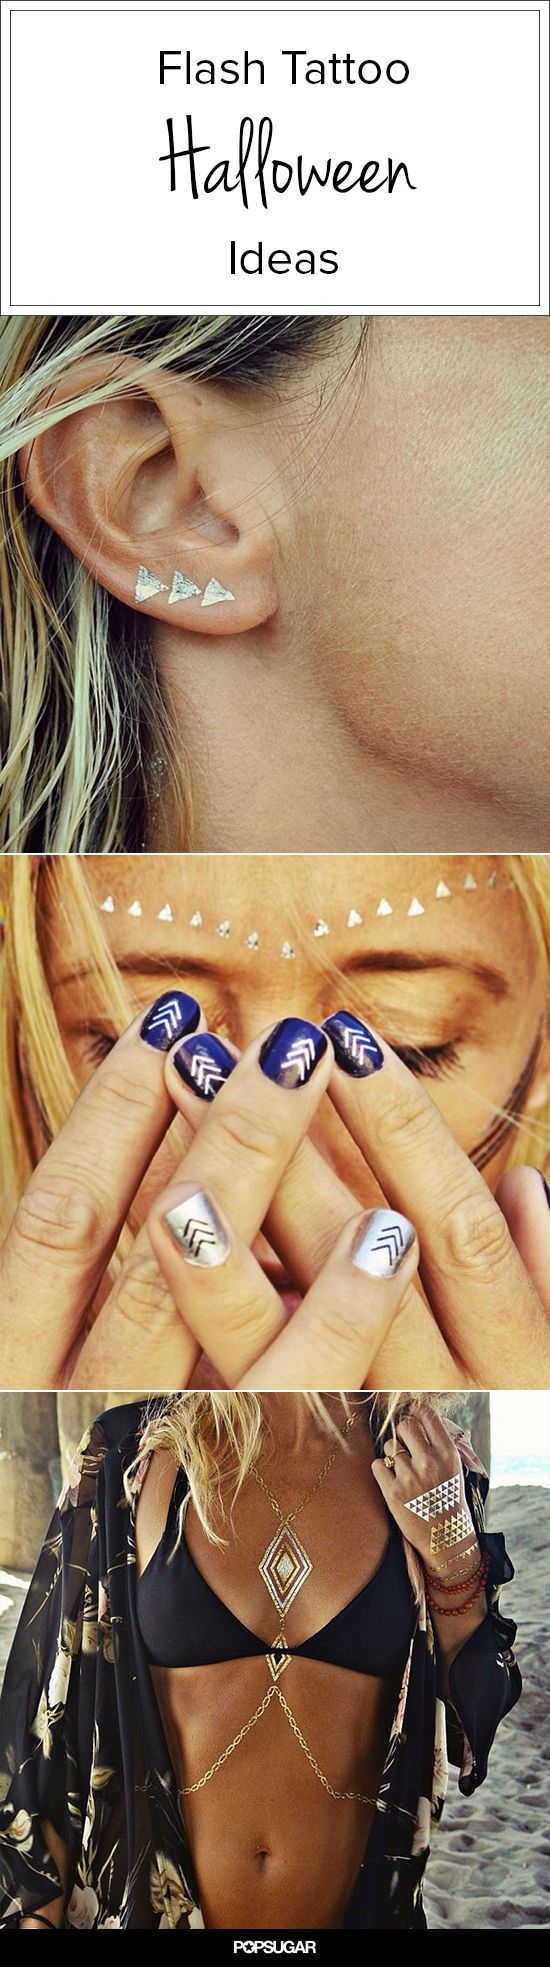 Meet Miranda Burnet, the Genius Entrepreneur Behind Flash Tattoos - Plus #Halloween Inspiration!